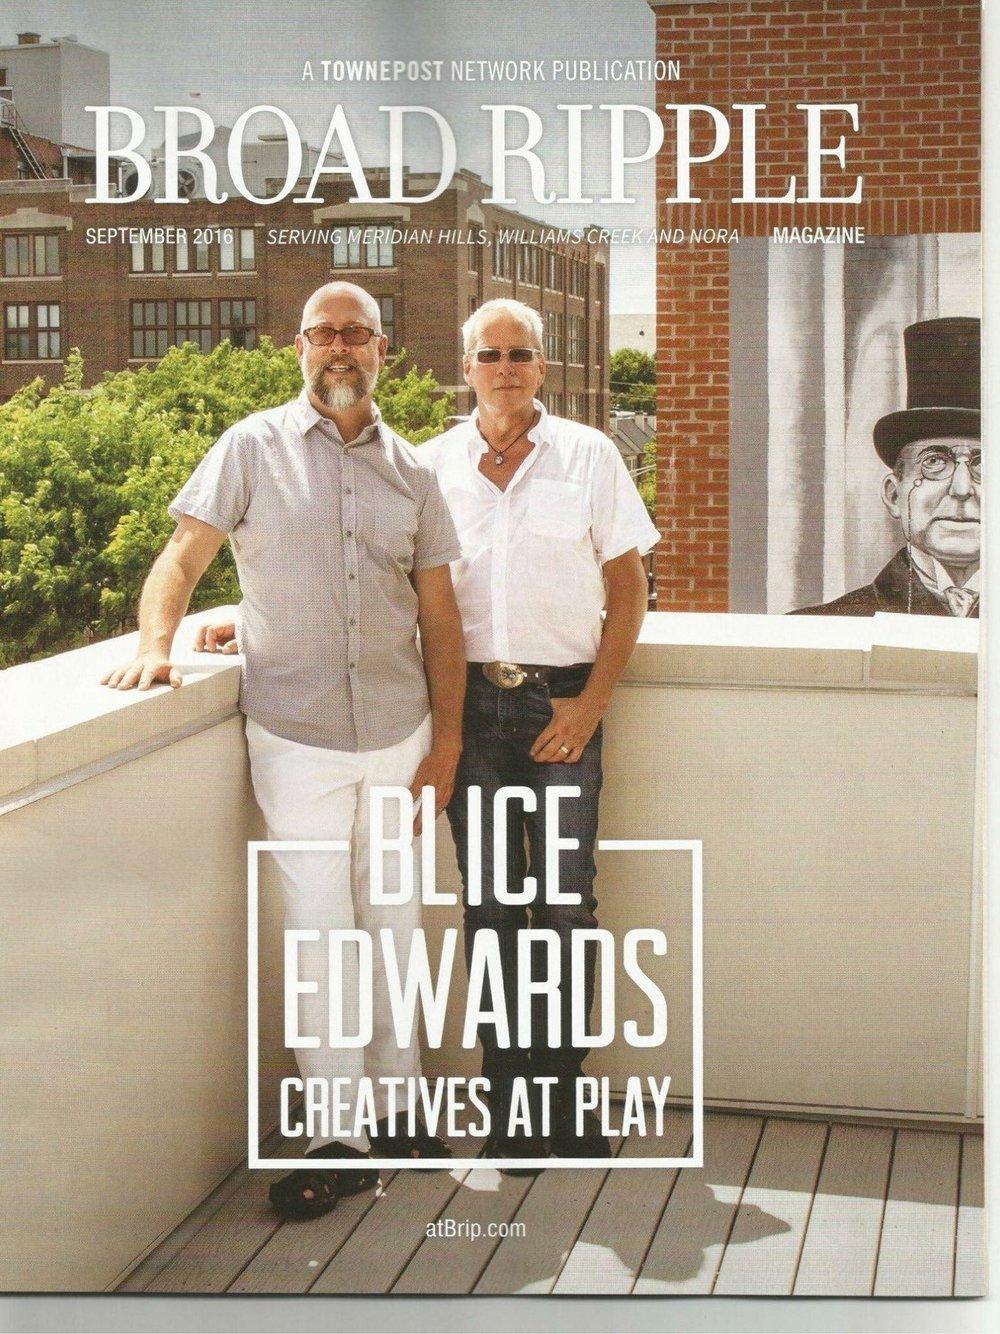 Blice+Edwards+Creatives.jpg